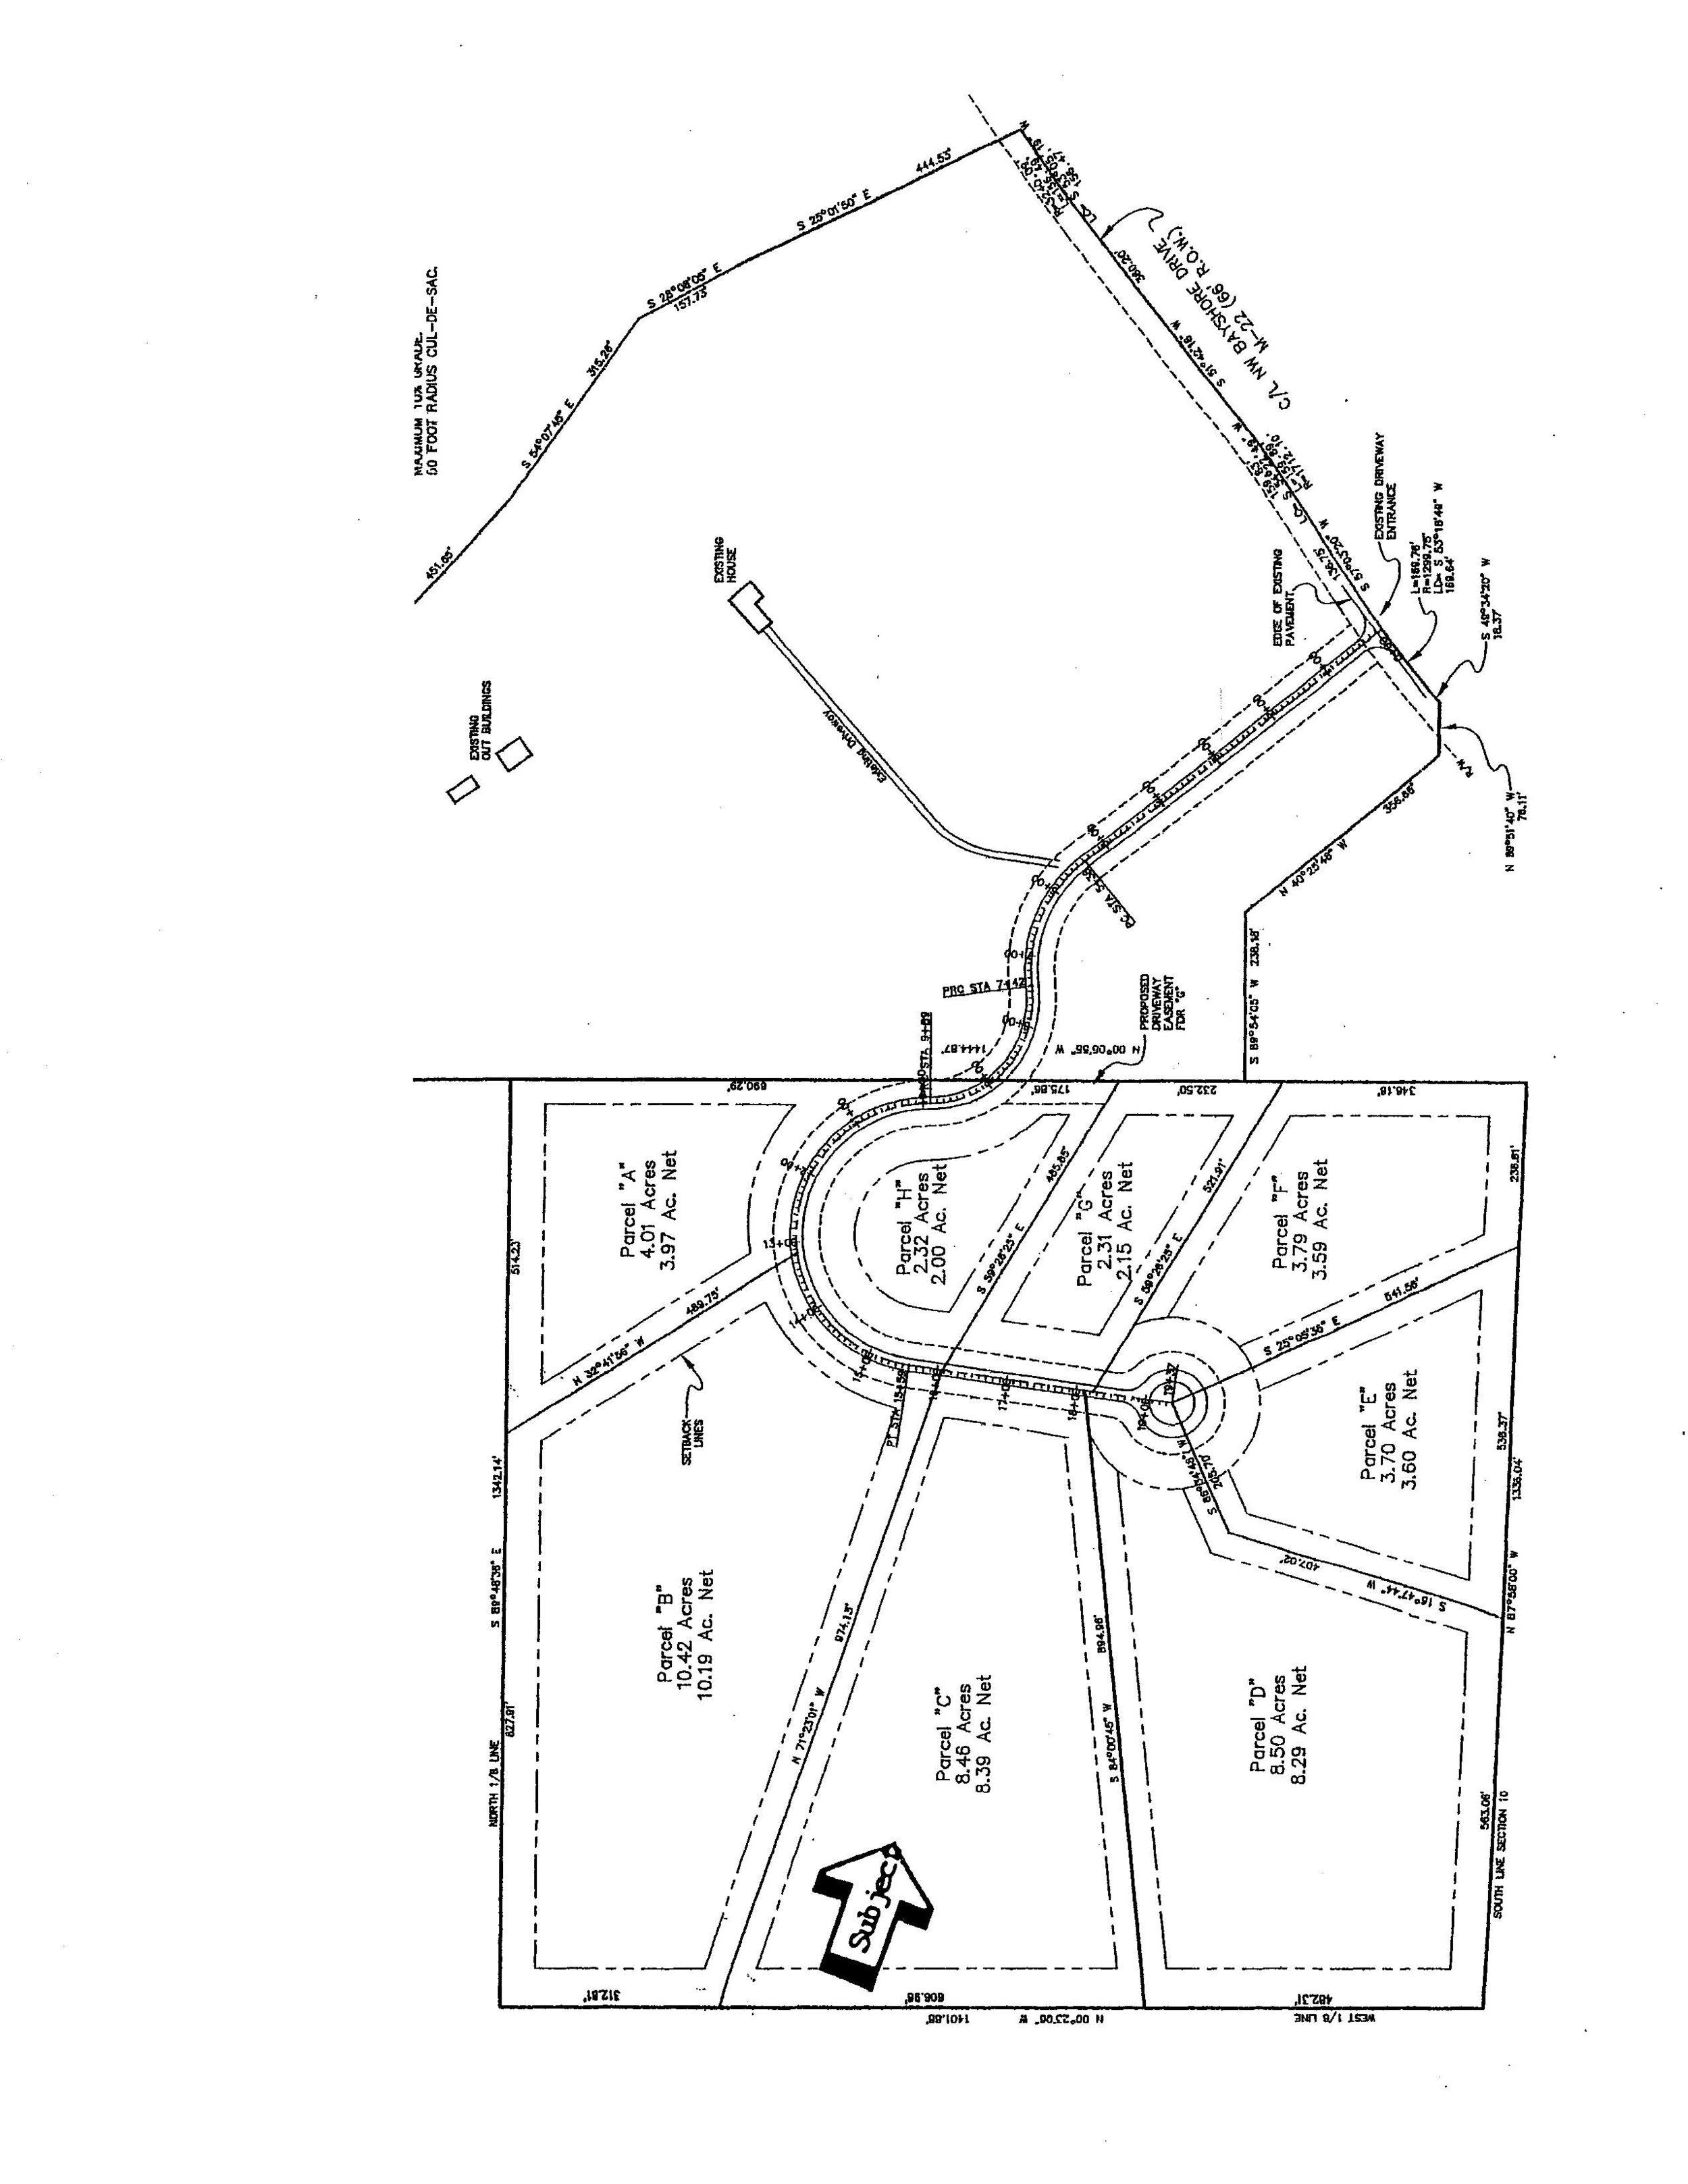 11635 E Belanger Woods Dr Marketing Packet - For Sale by Oltersdorf Realty LLC (9).jpg